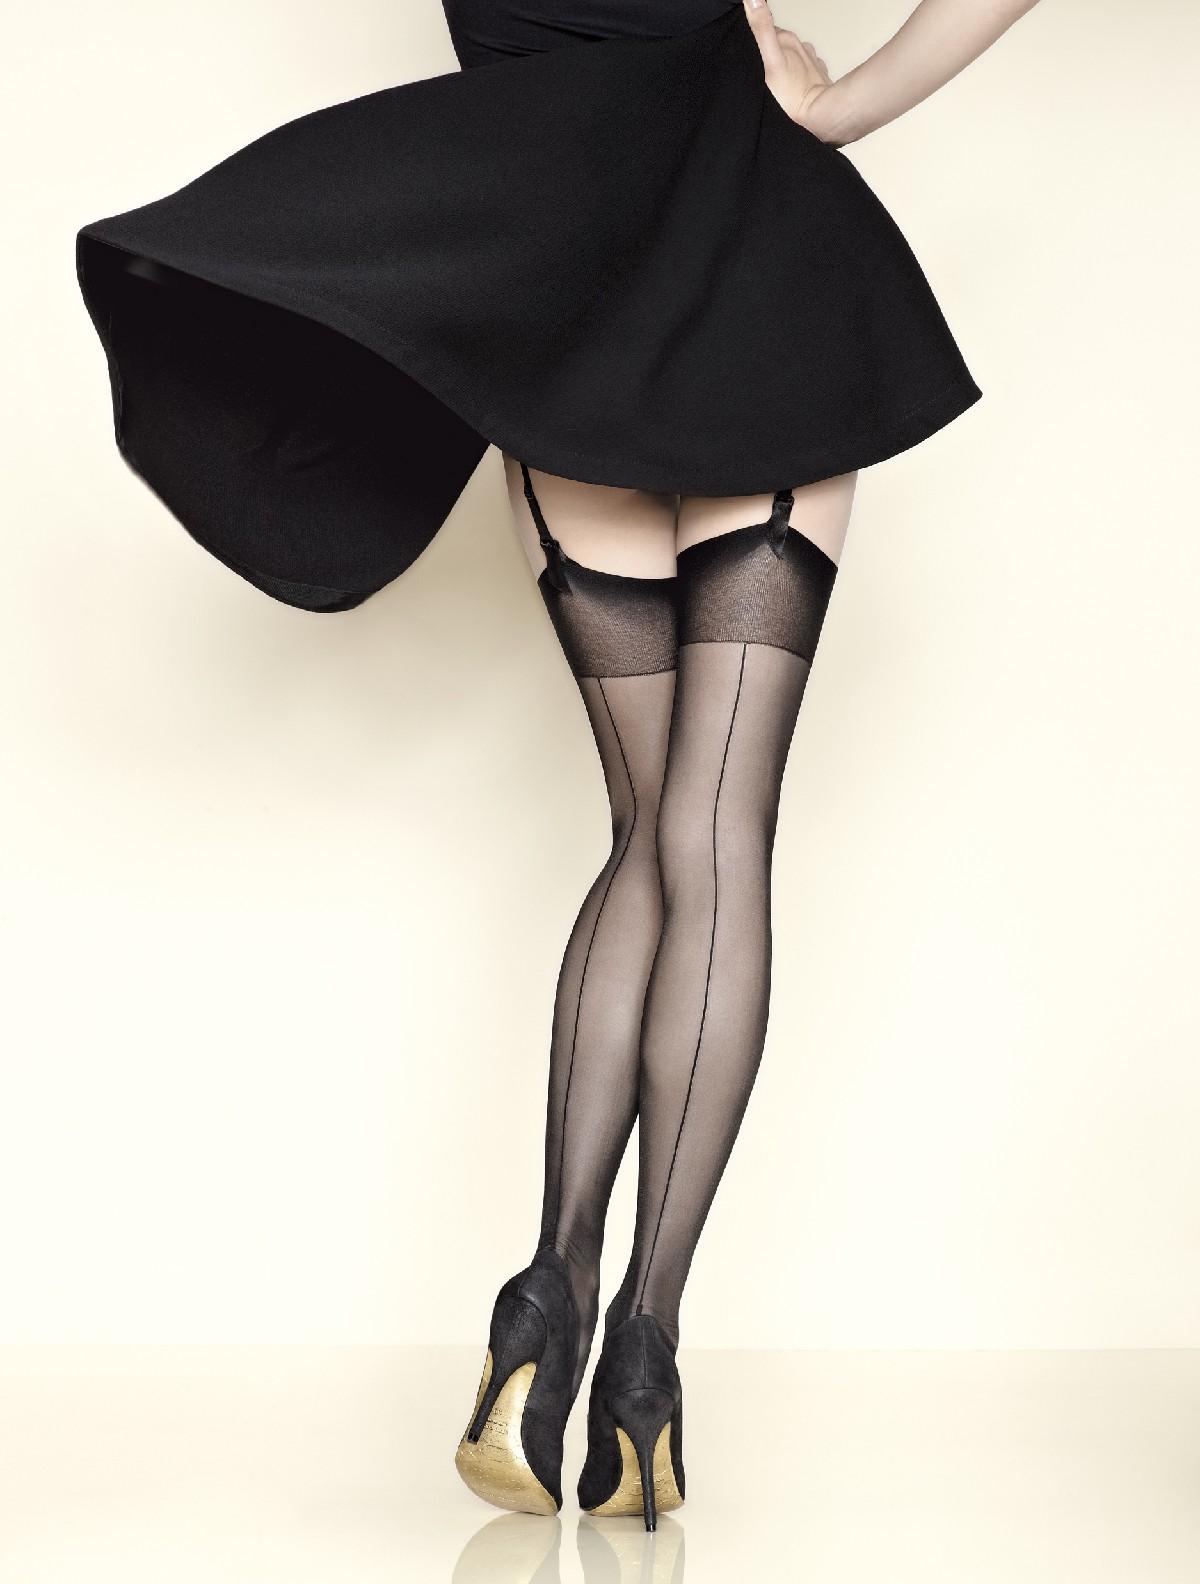 830d2b60b Gerbe Fatal 15 seamed Stockings black